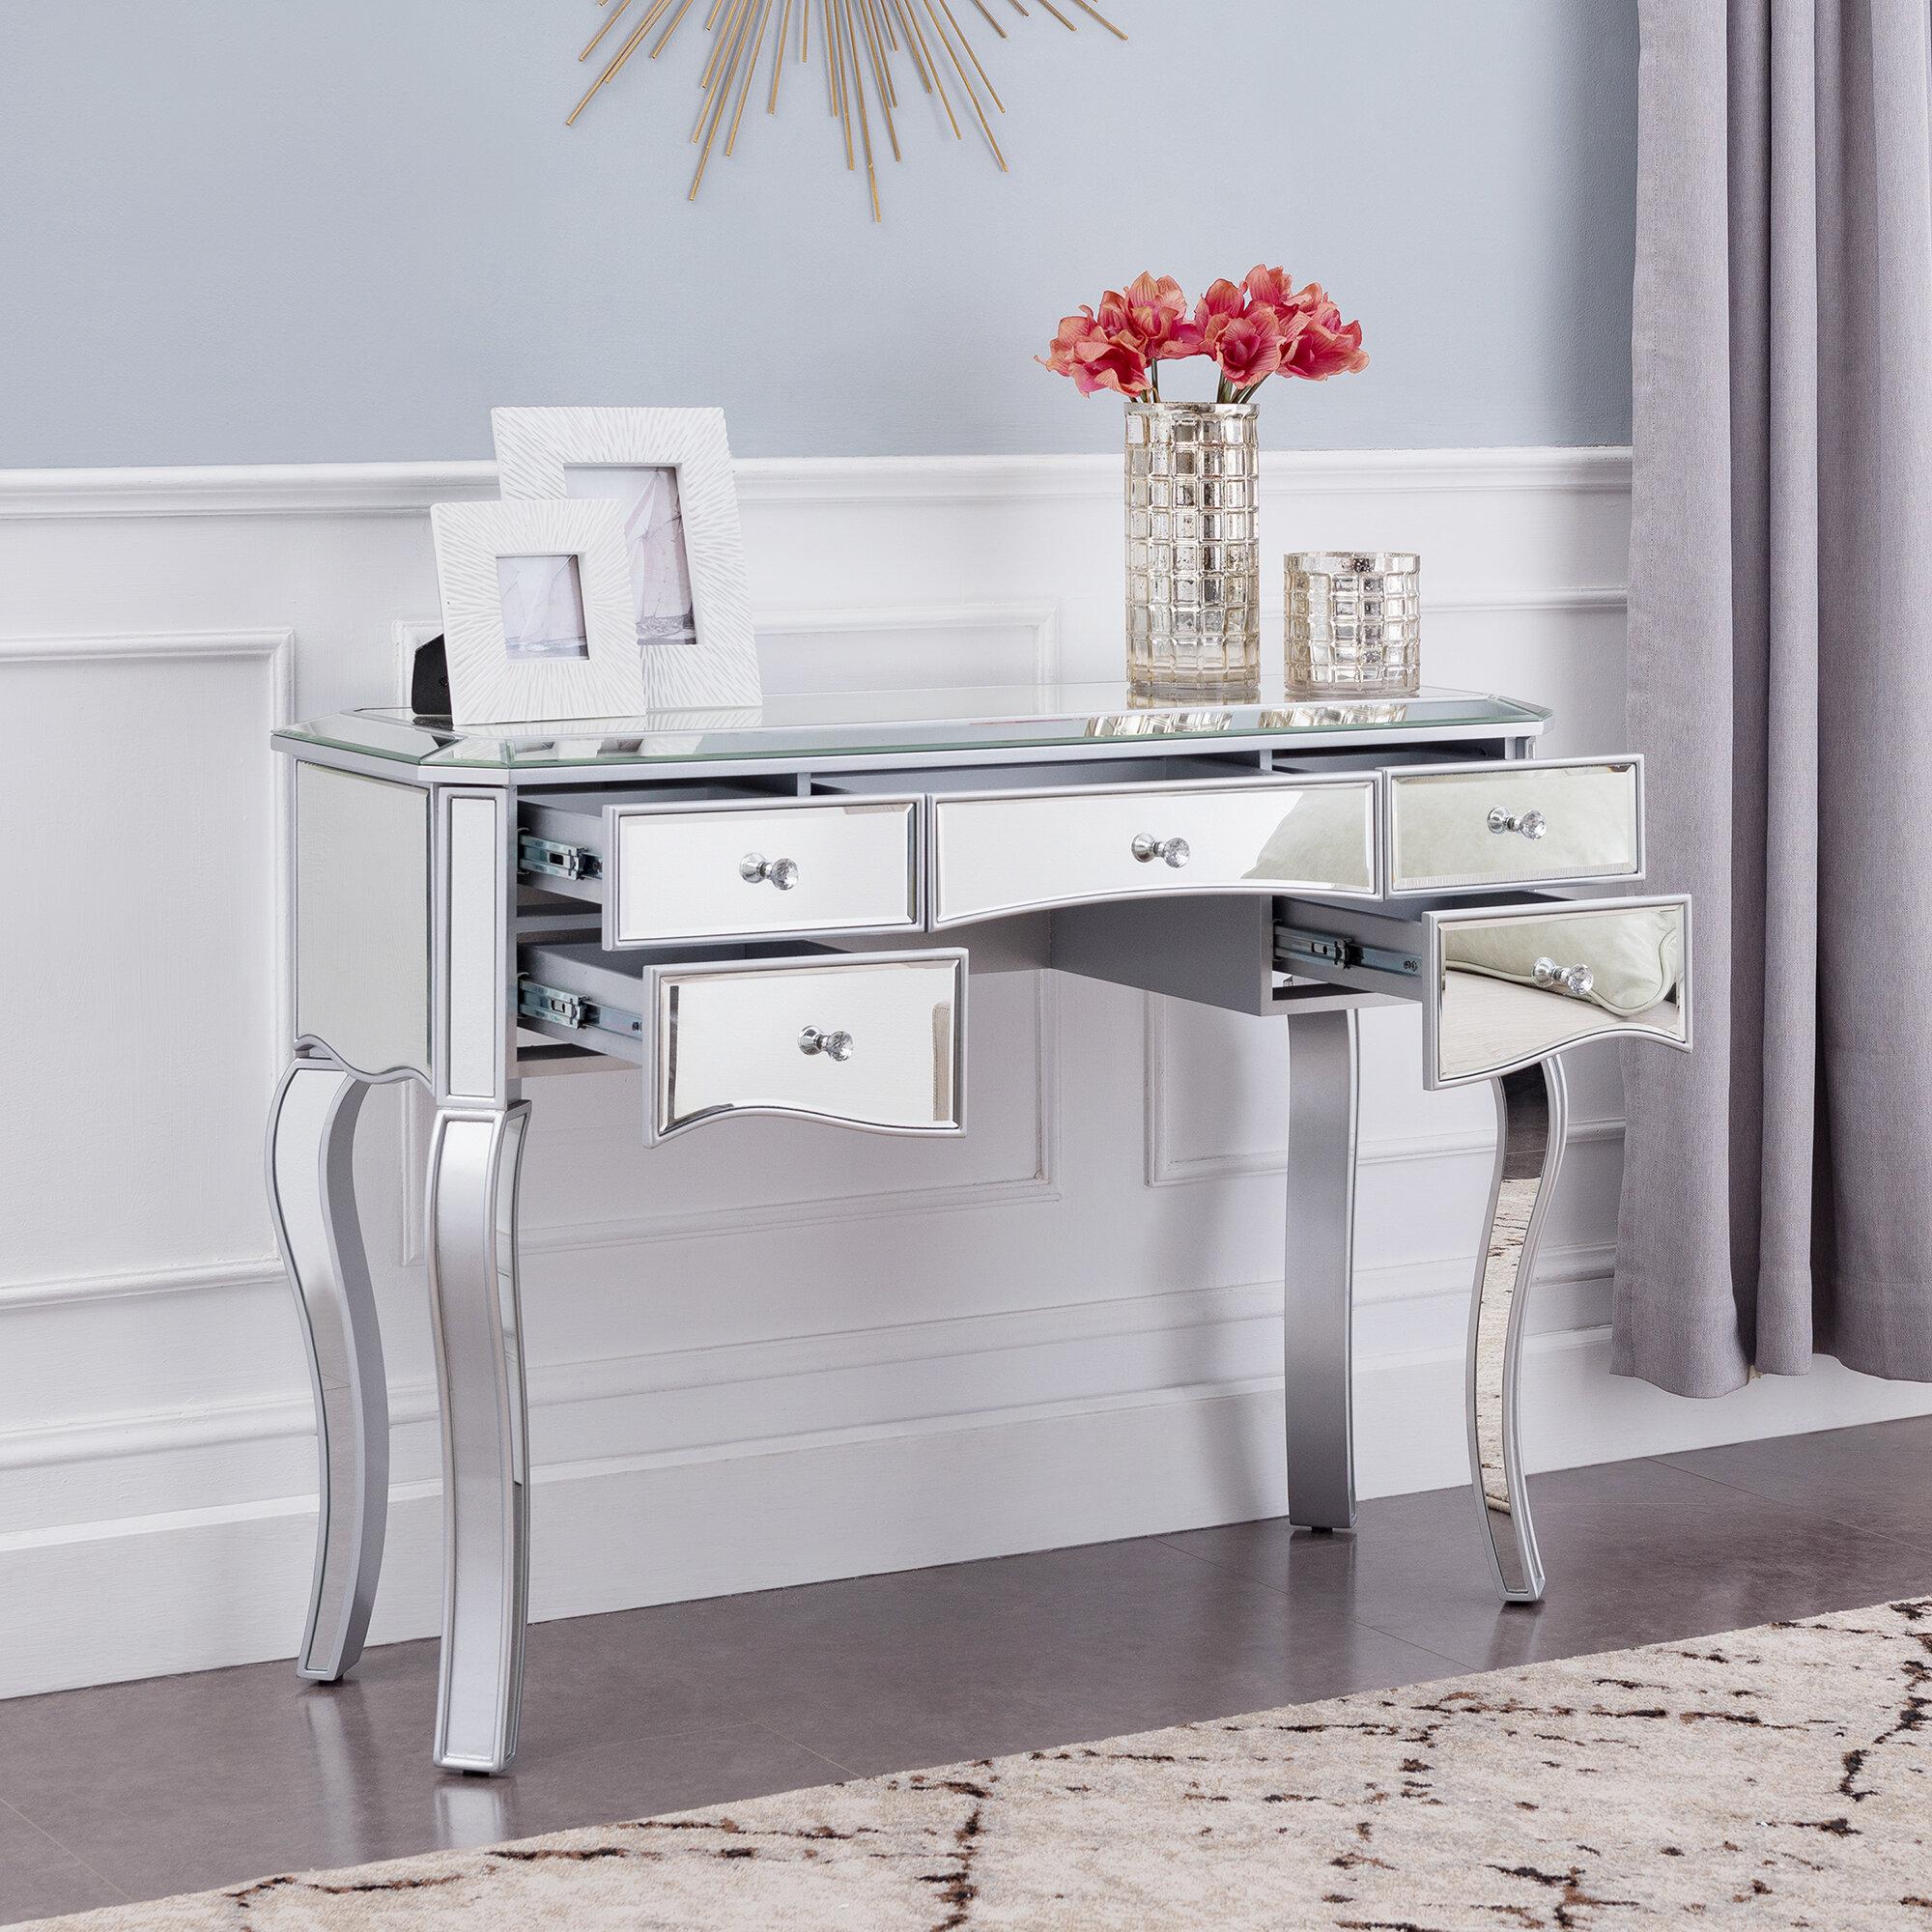 Charmant Moyne Mirrored Glass Desk